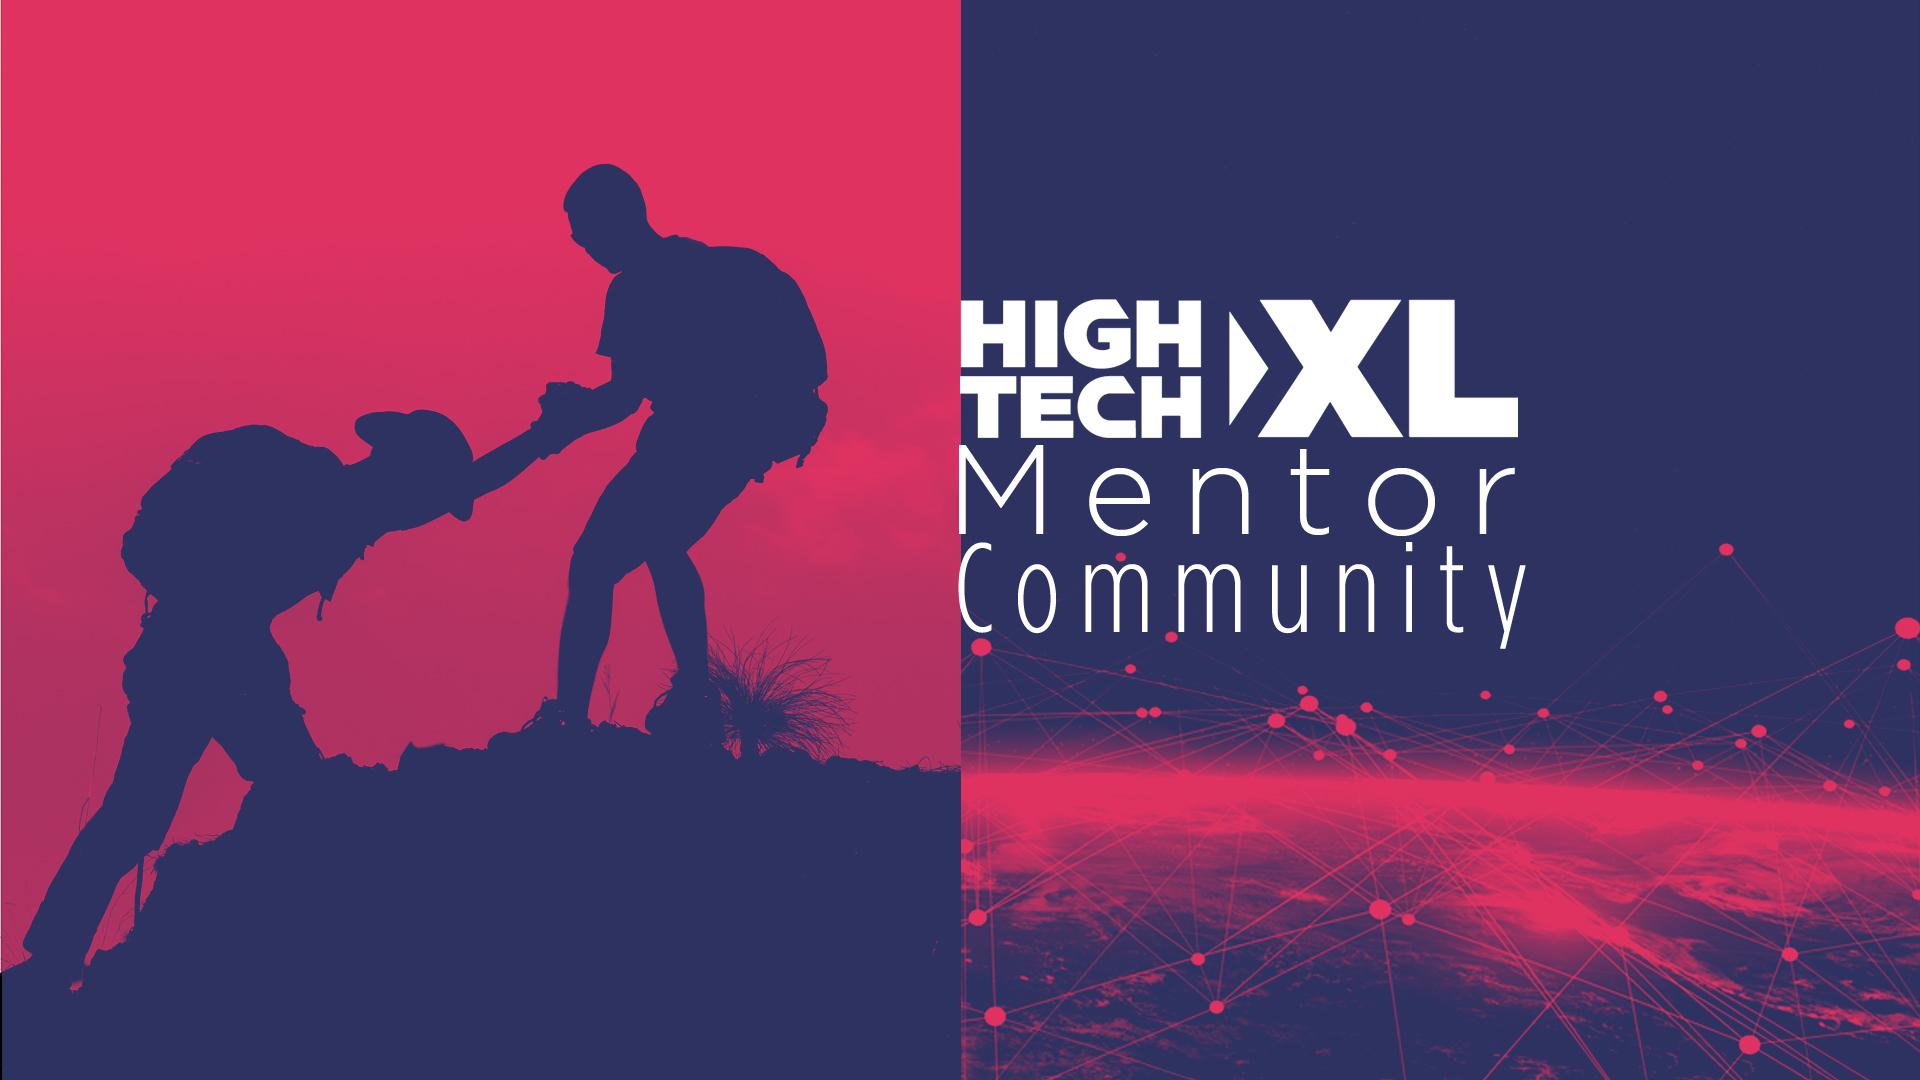 HighTechXL_Mentor-Community-Program